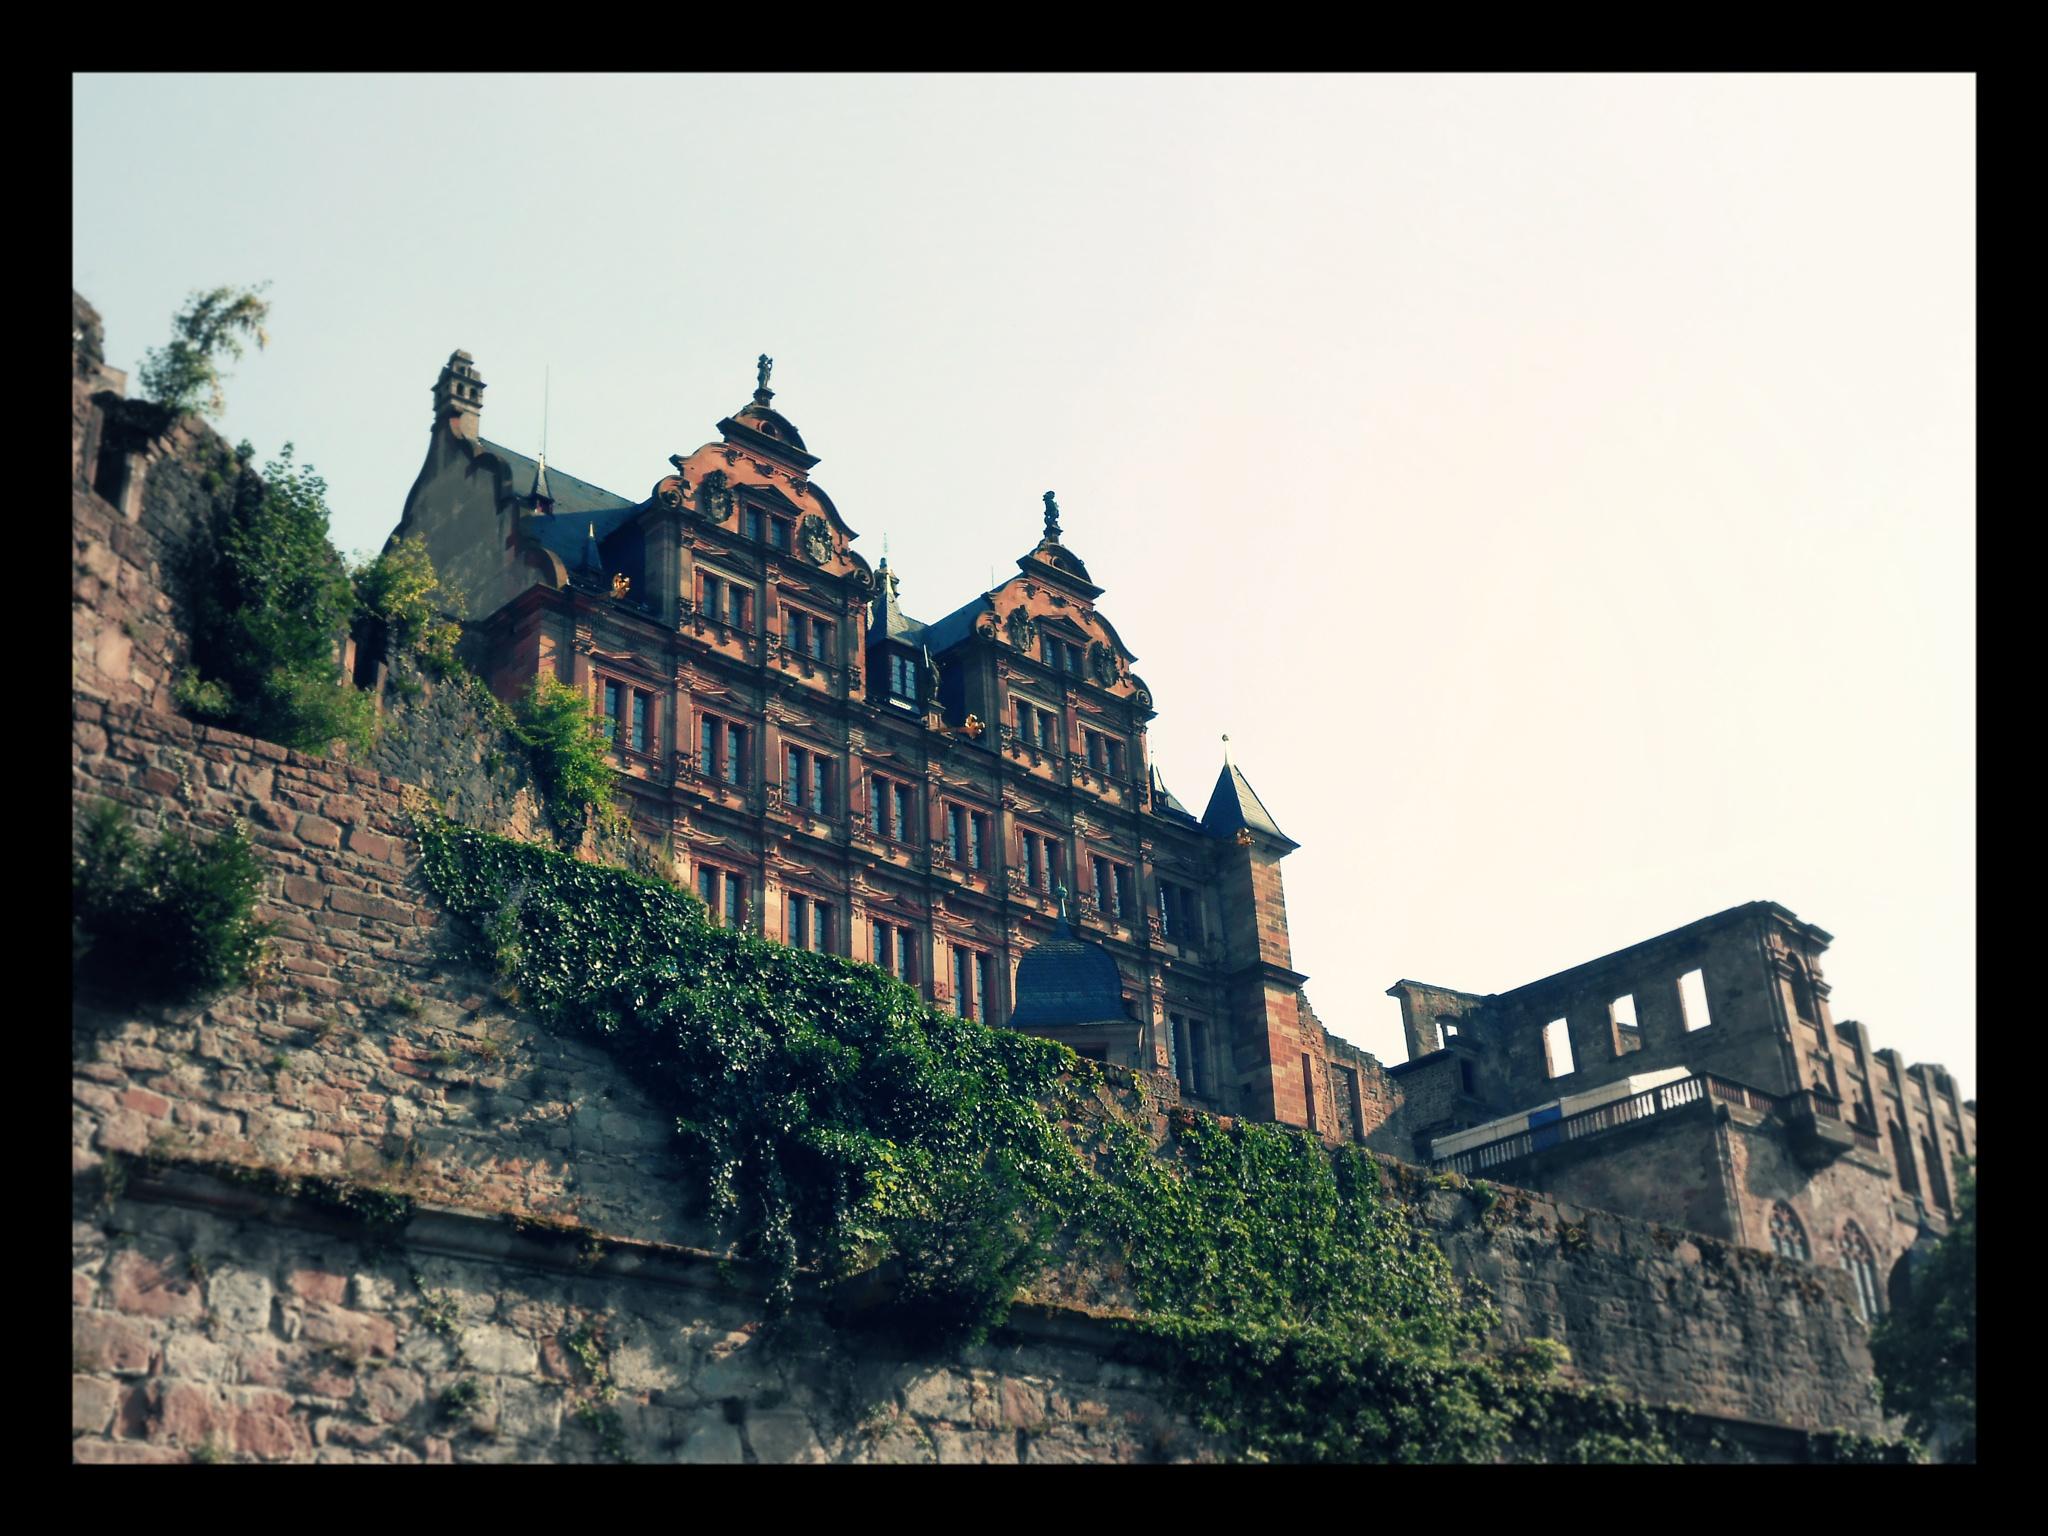 Heidelberg Palace, Heidelberg, Germany (Print) by StevenKlabunde